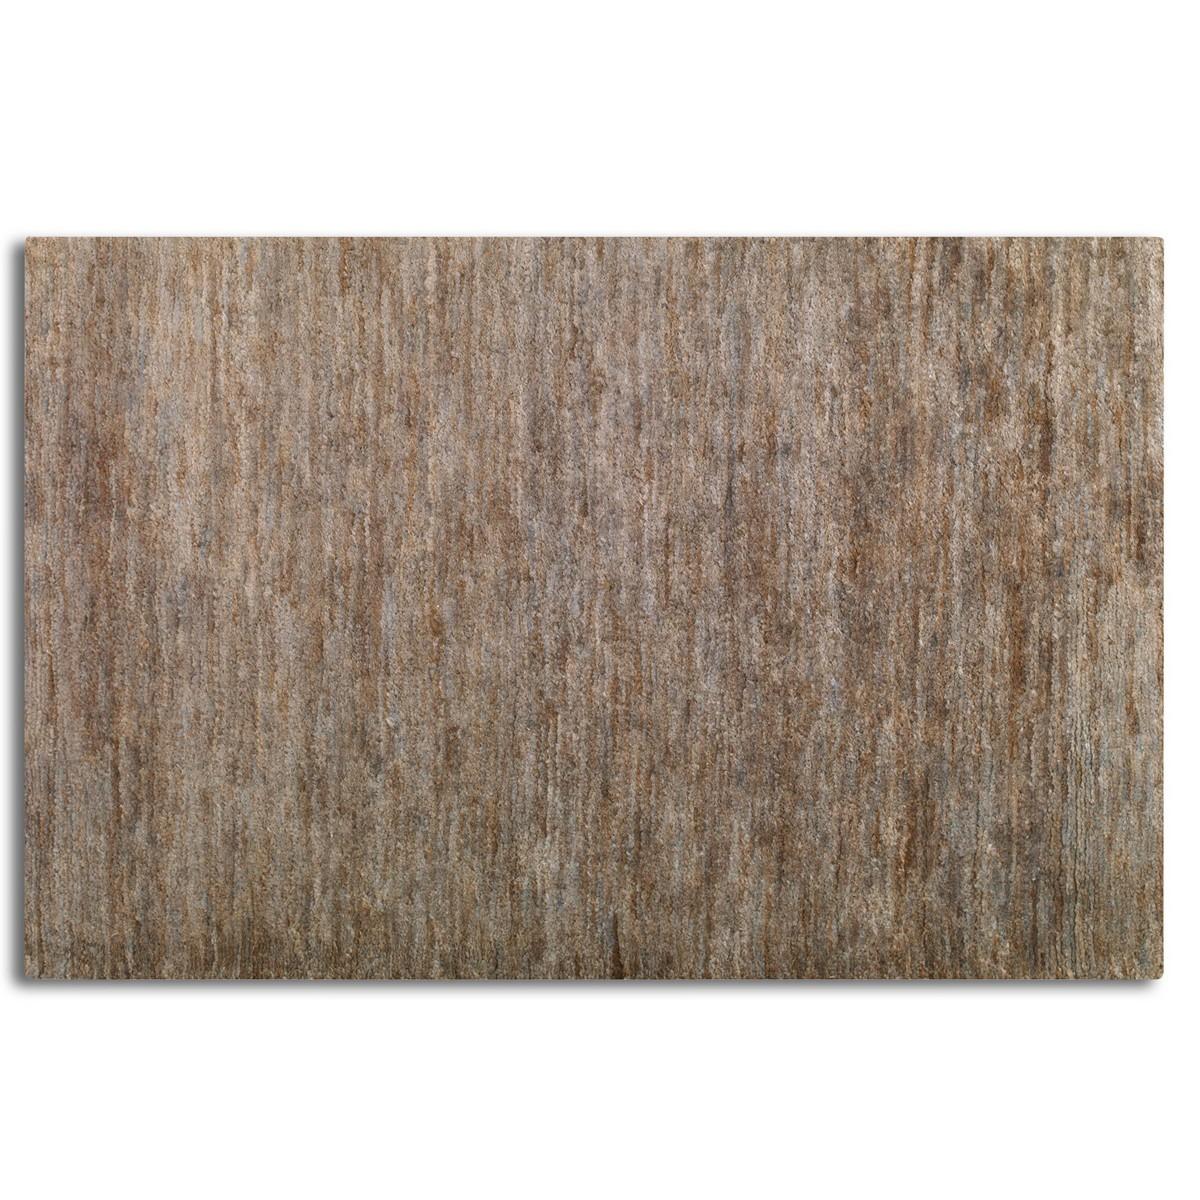 Uttermost Mounia 6 X 9 Rug - Rust Blue